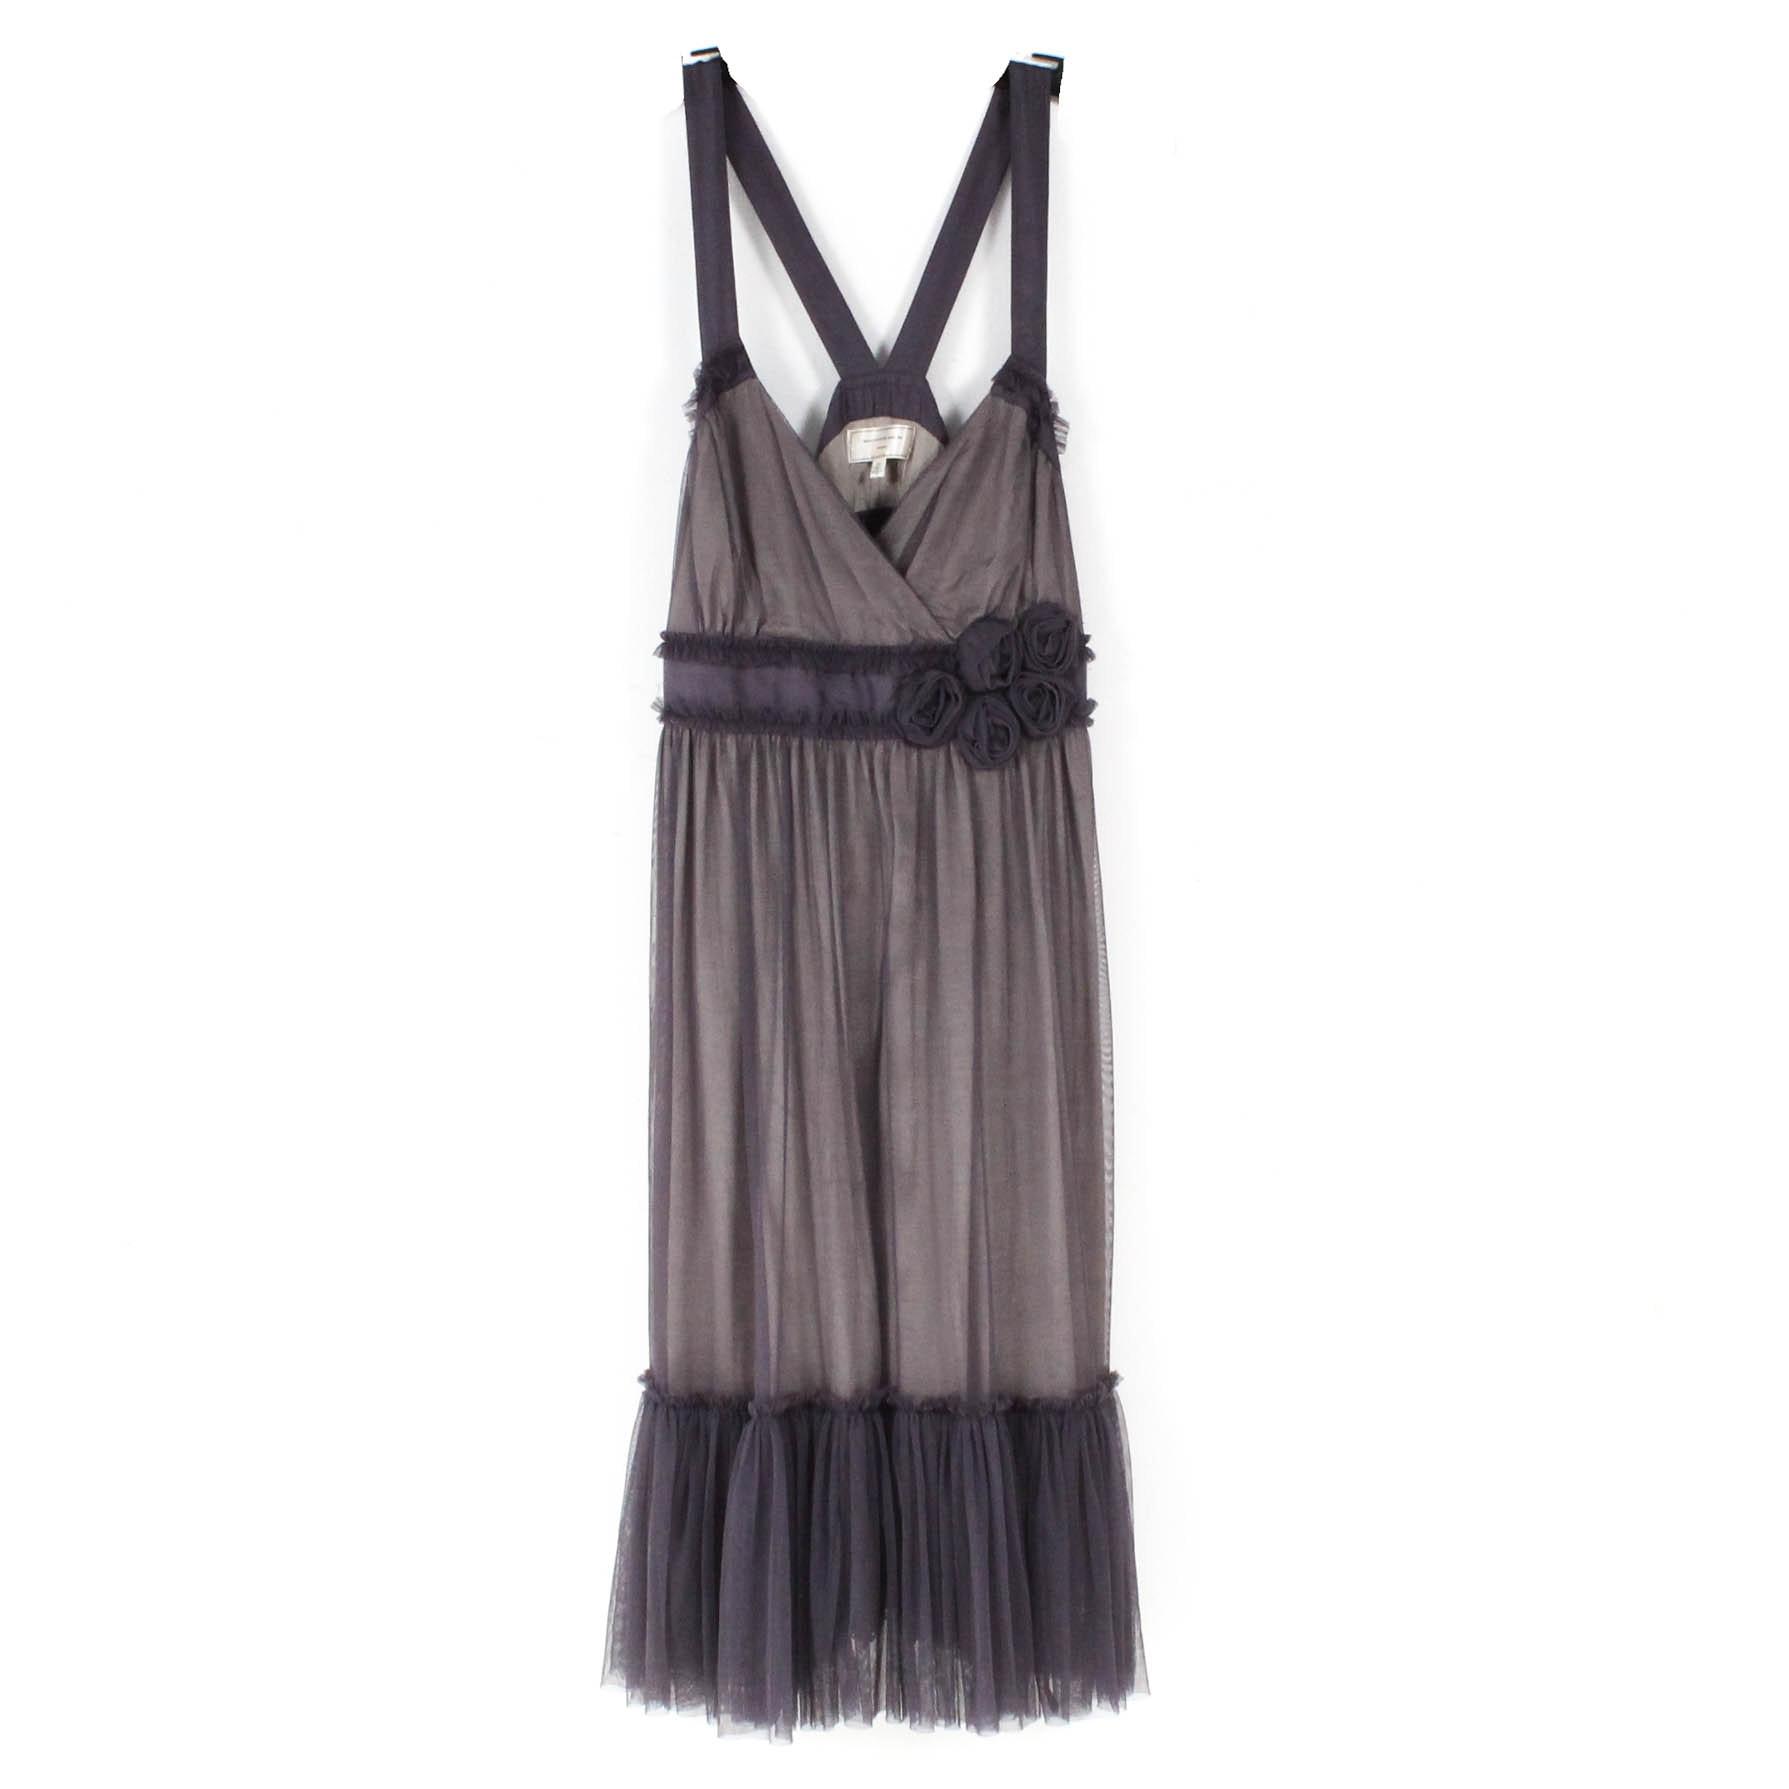 Moulinette Soeurs For Anthropologie Silk and Tulle Sleeveless Dress